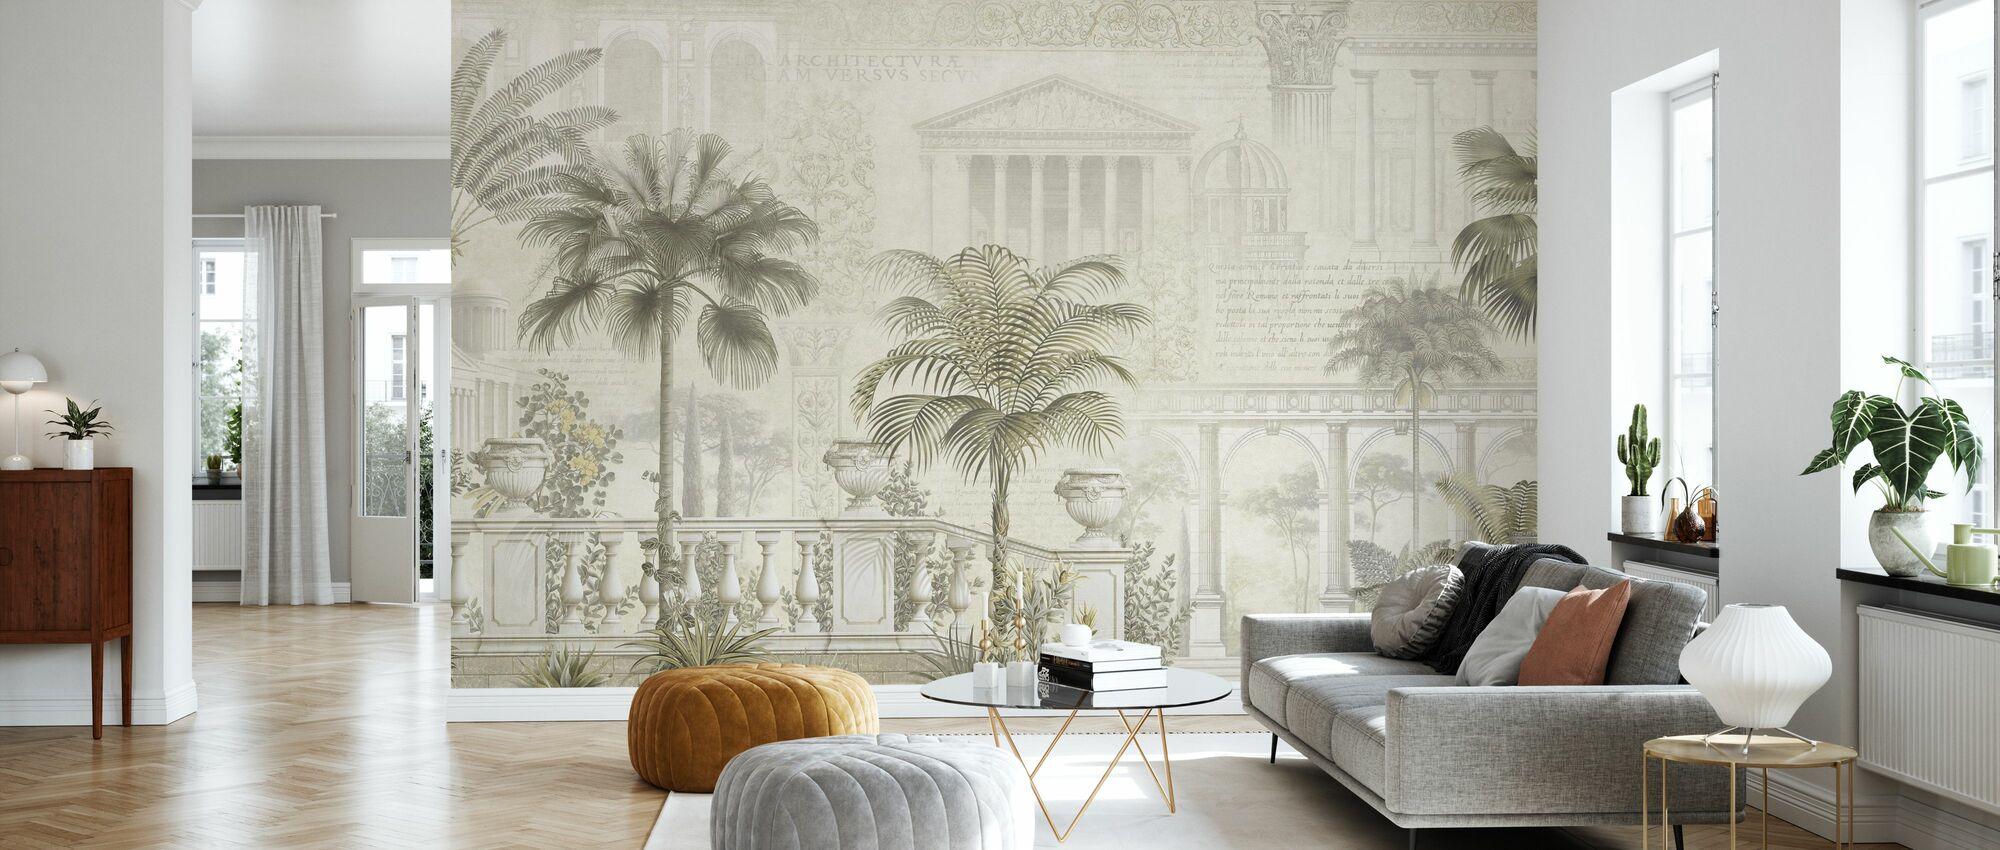 Tropical Residence - Sepia - Wallpaper - Living Room